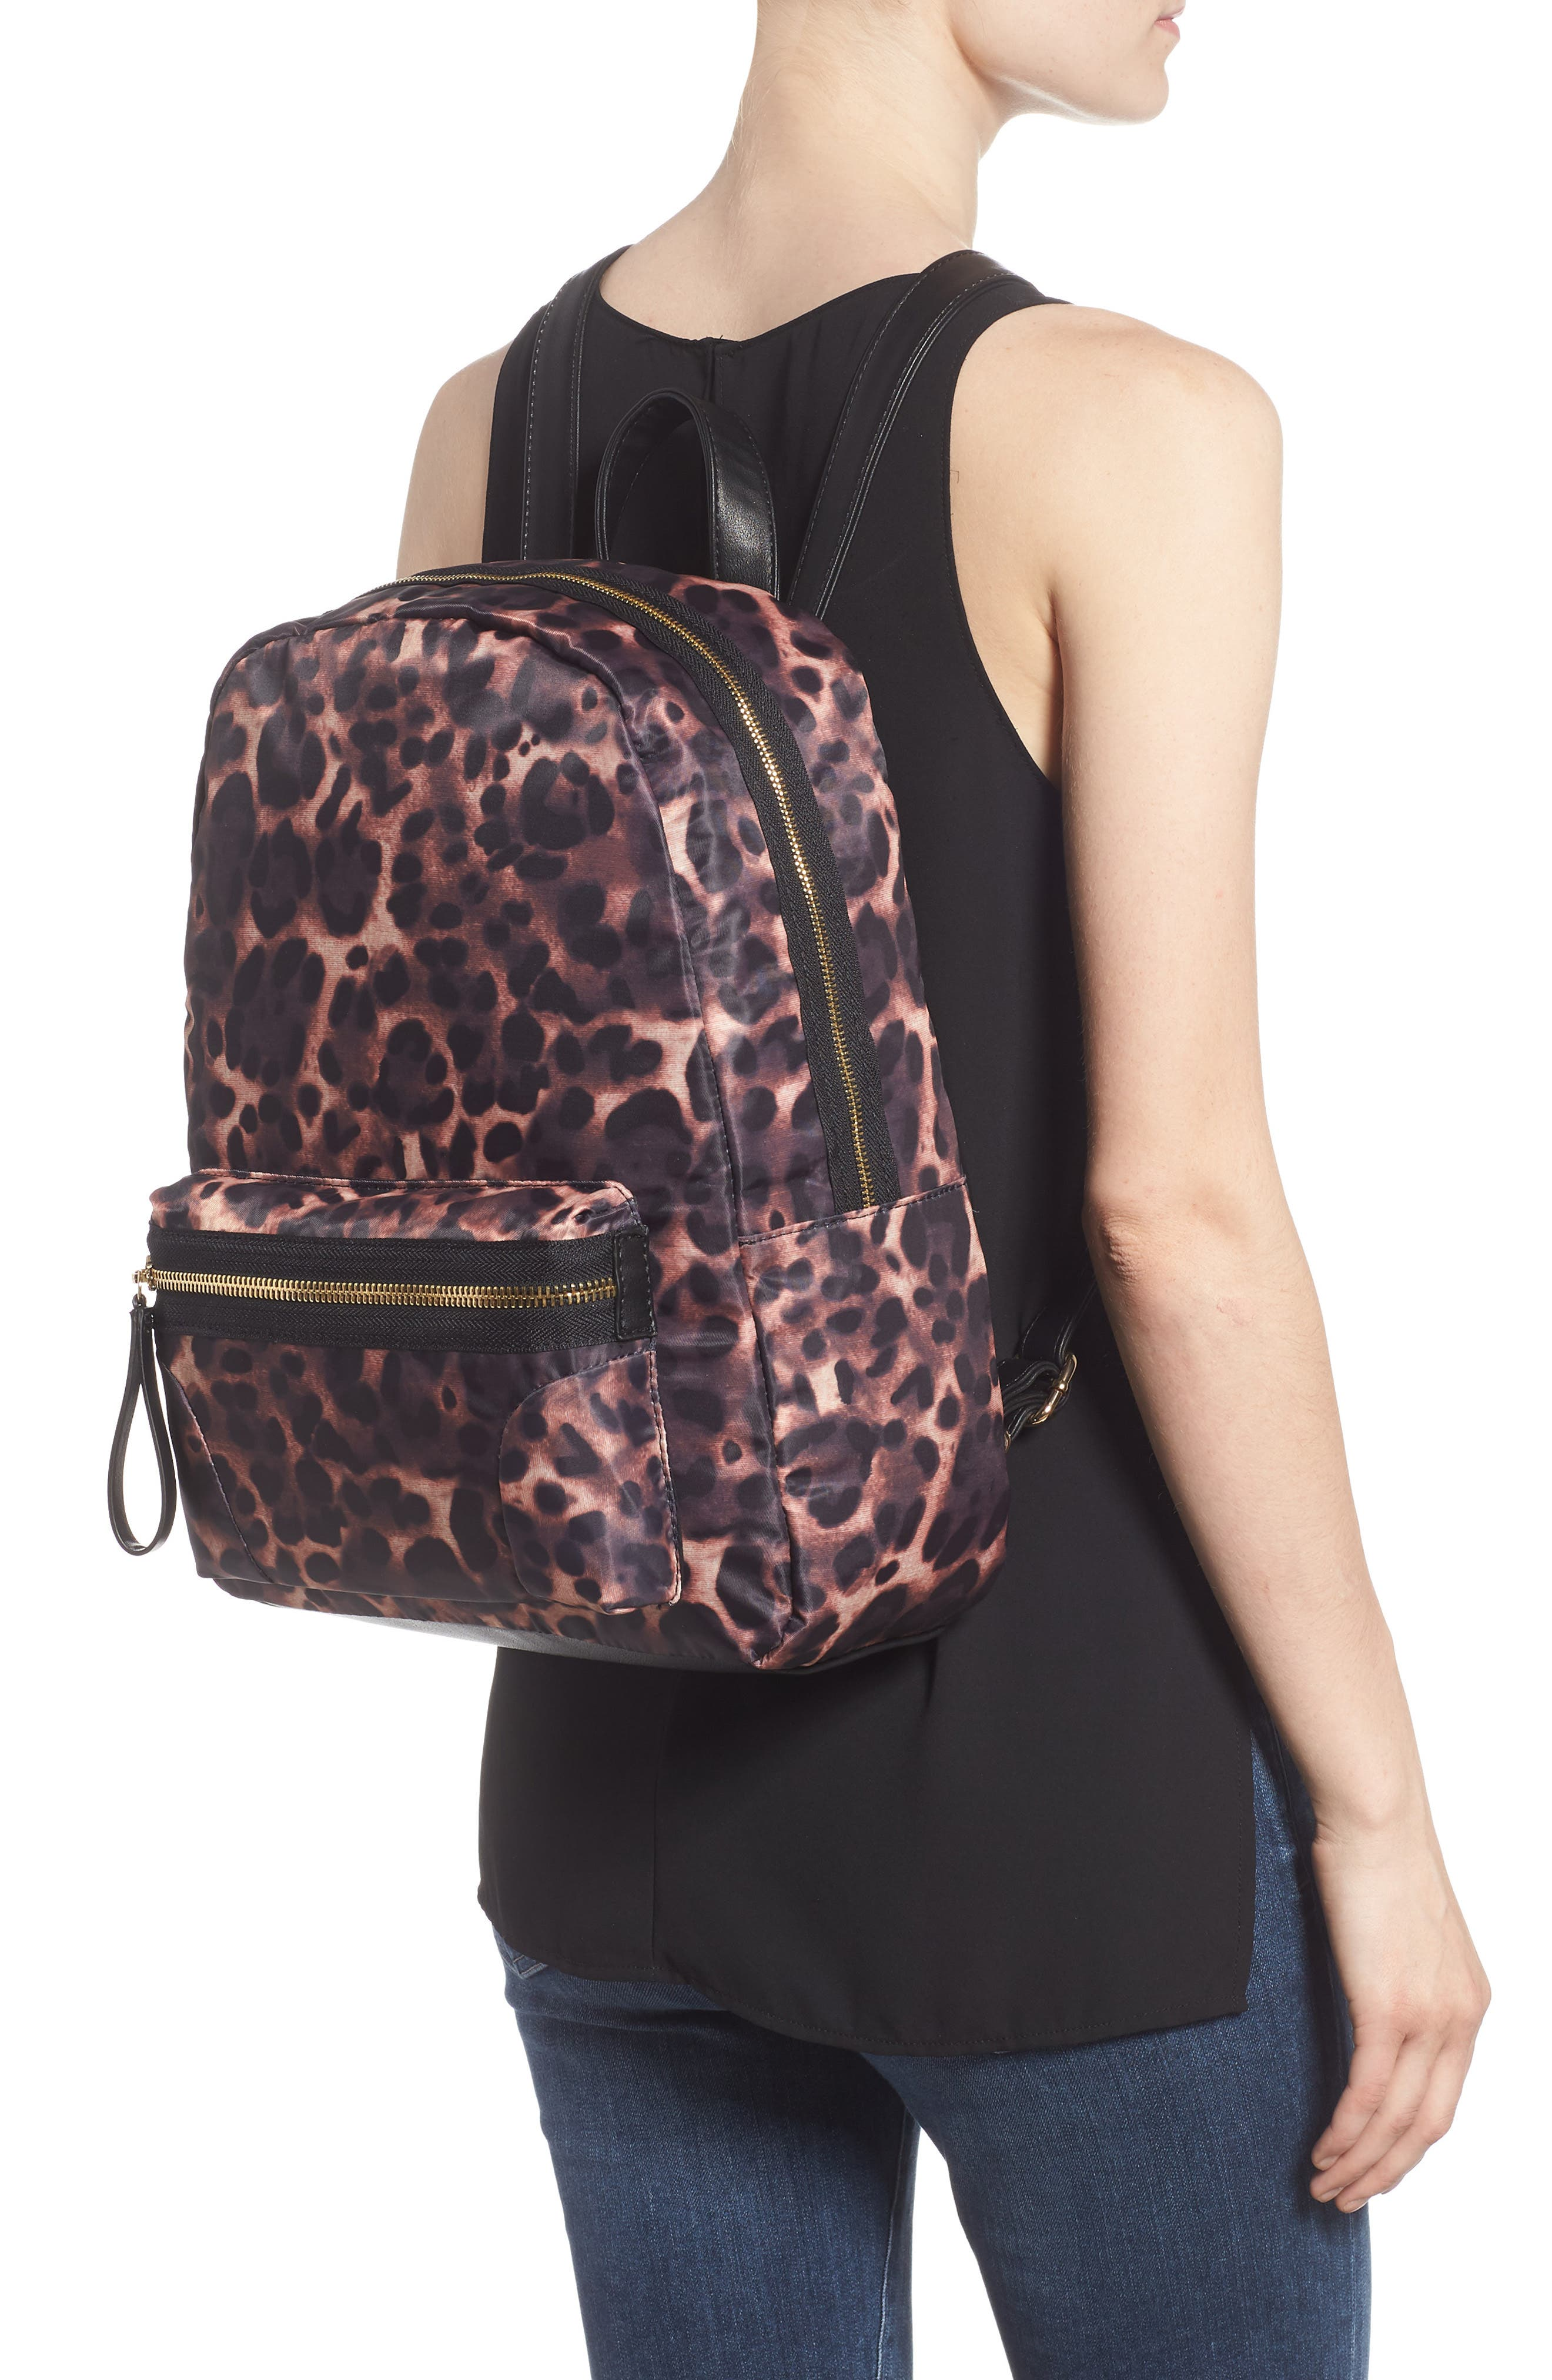 Leopard Print Nylon Backpack,                             Alternate thumbnail 2, color,                             200